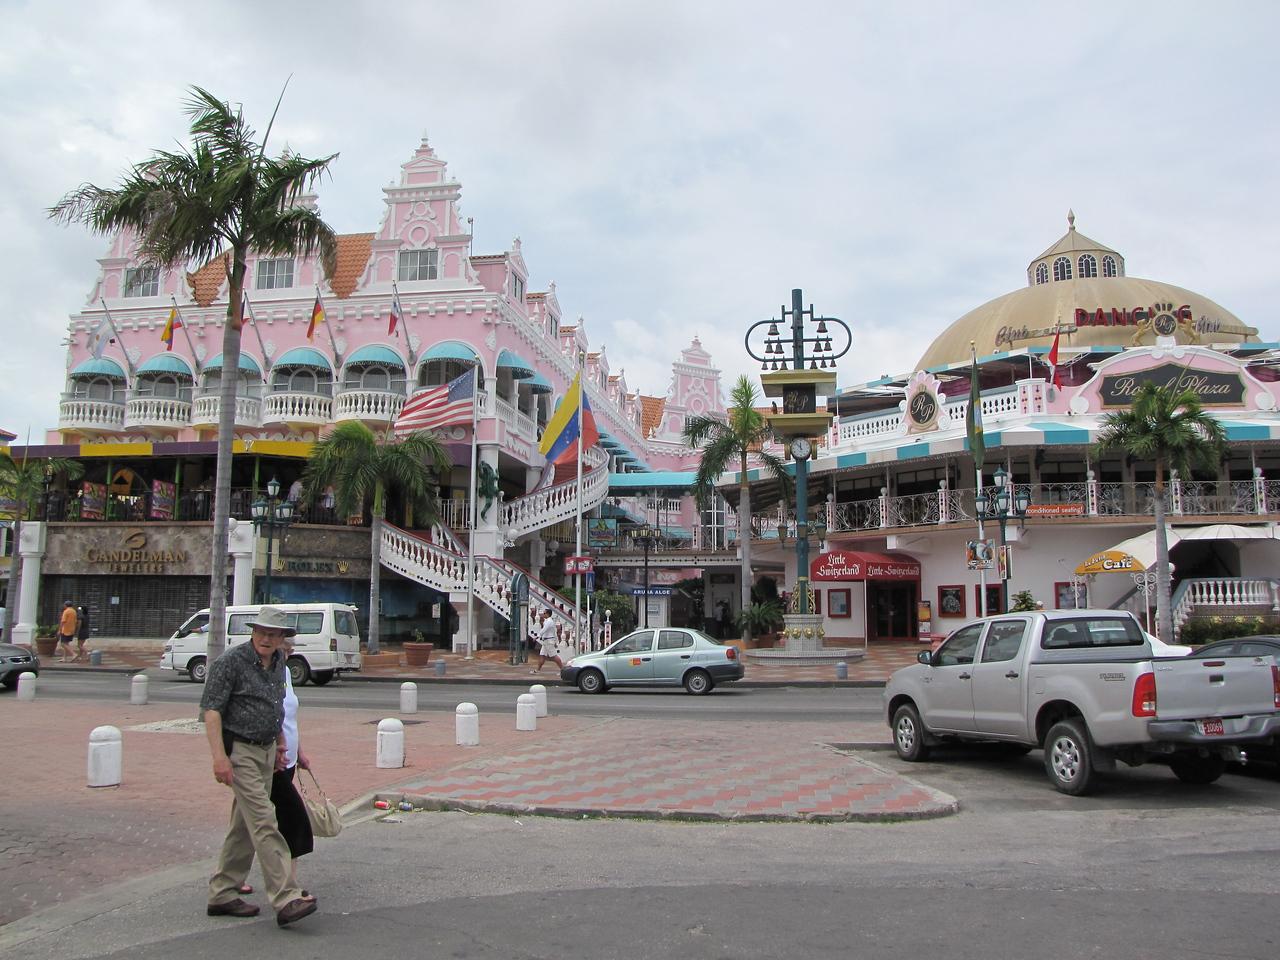 Iguana Joe's is in that complex.